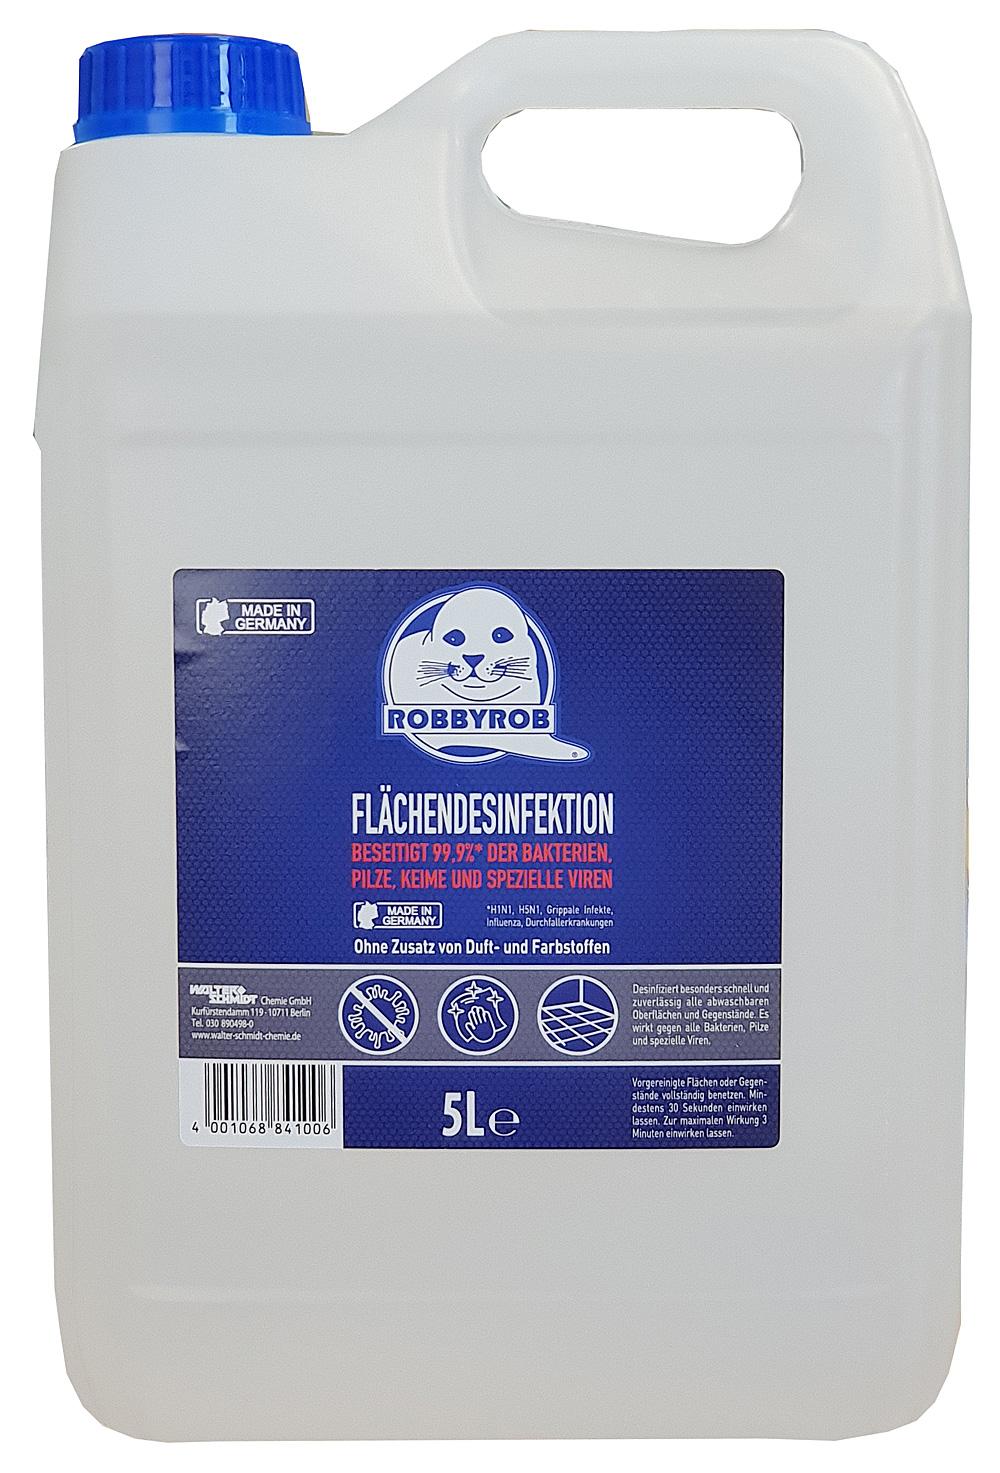 Desinfektionsmittel Handedesinfektionsmittel 2 X 1 Liter Gunstig